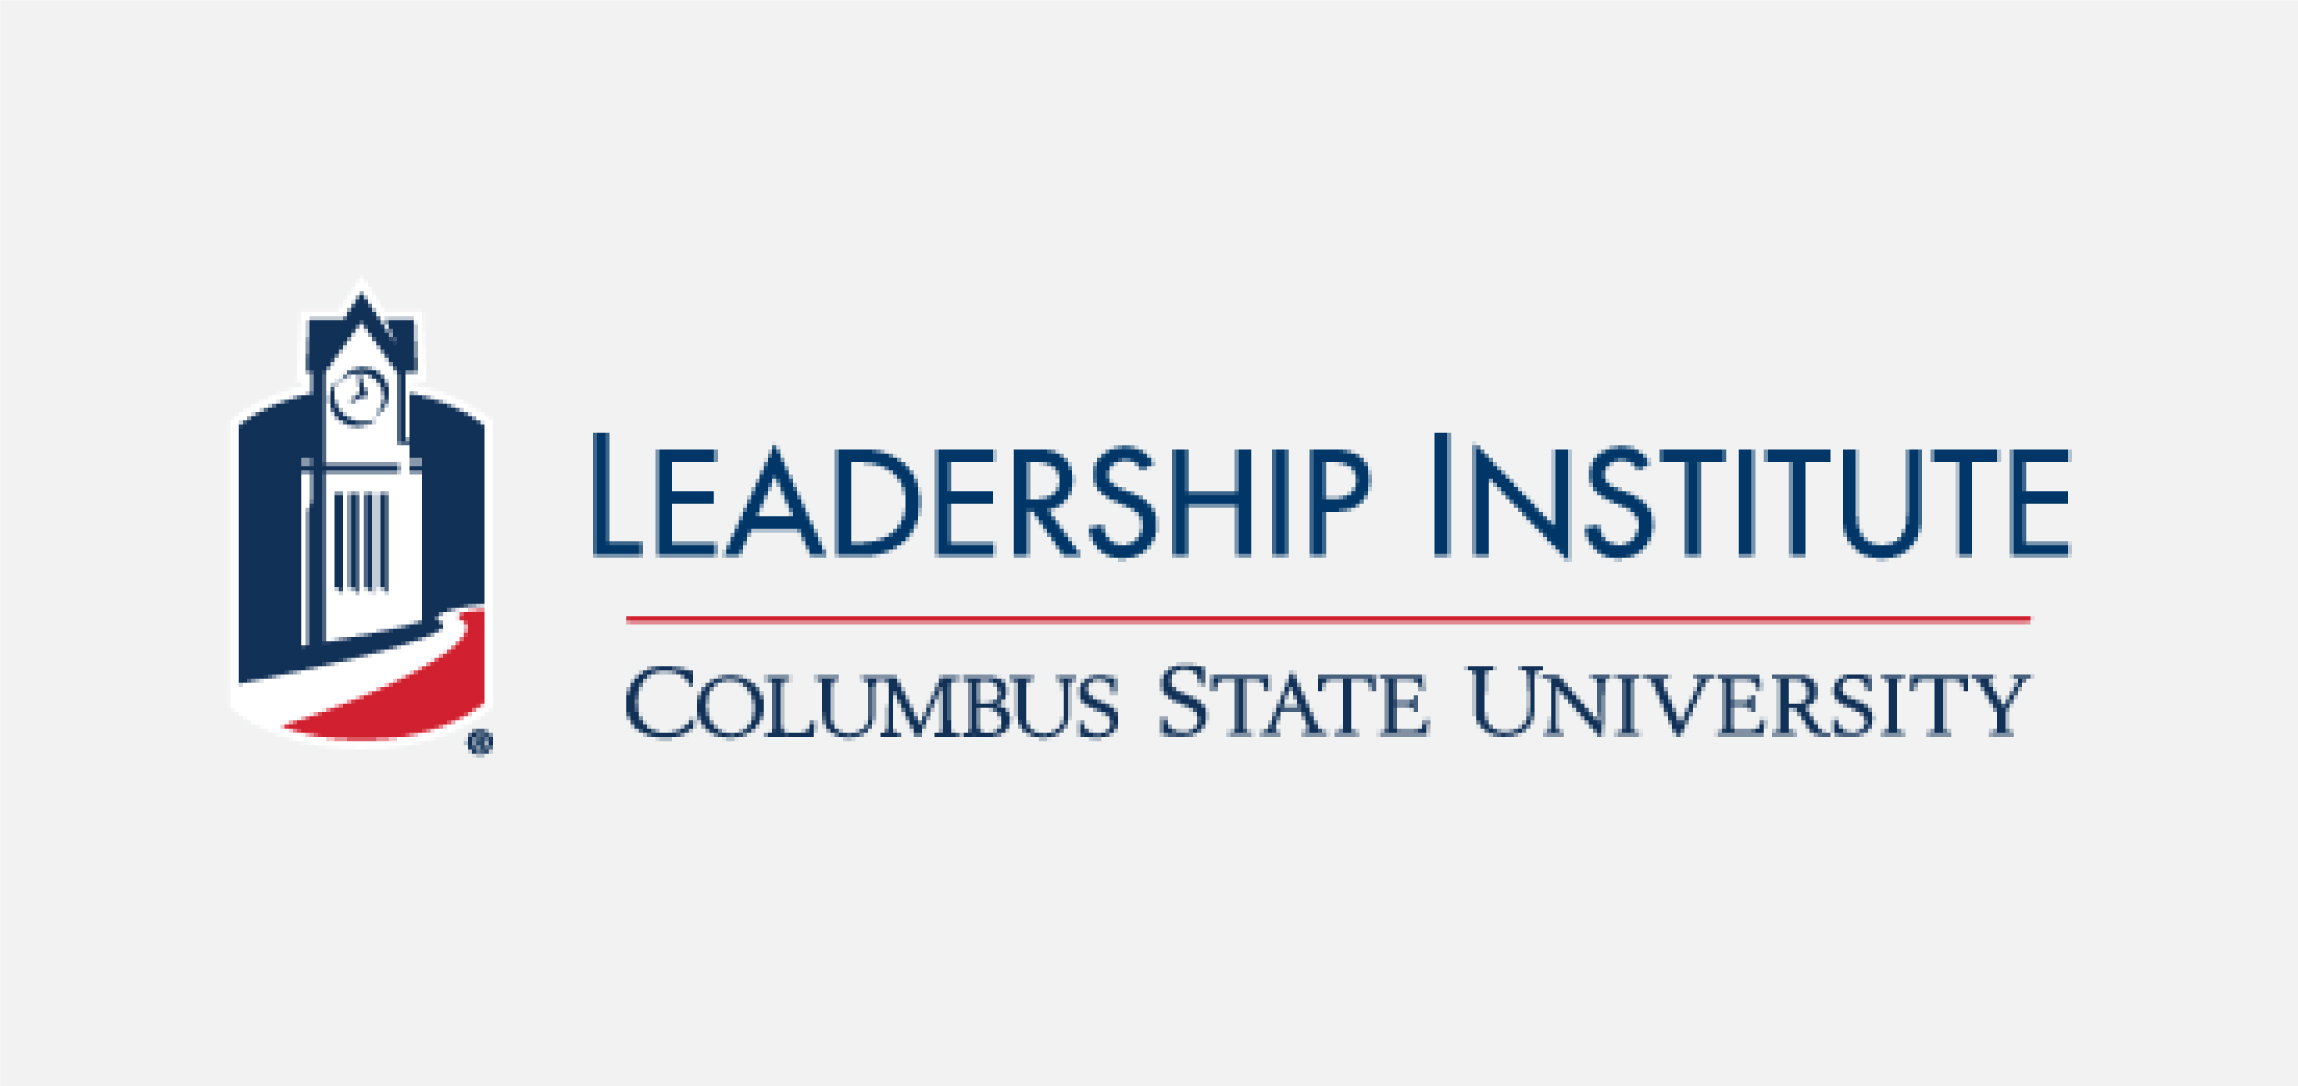 LeadershipLogo-01.jpg